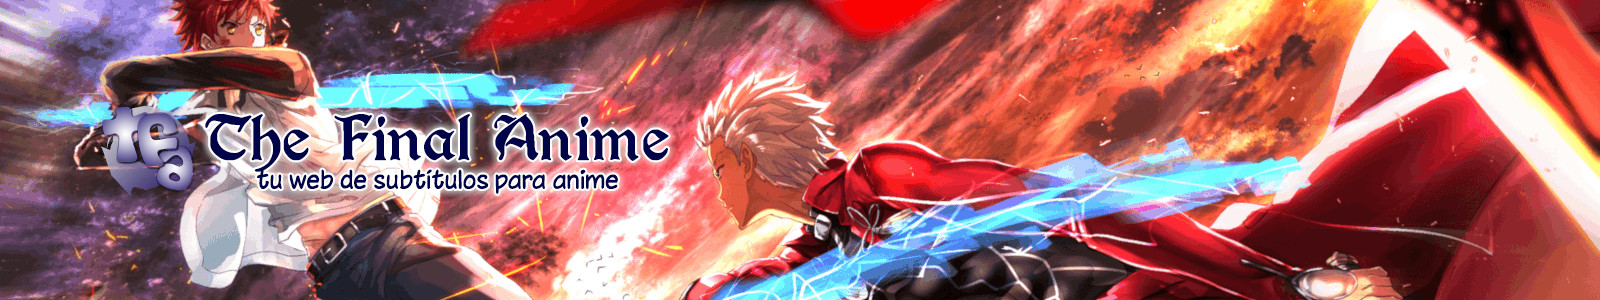 The Final Anime